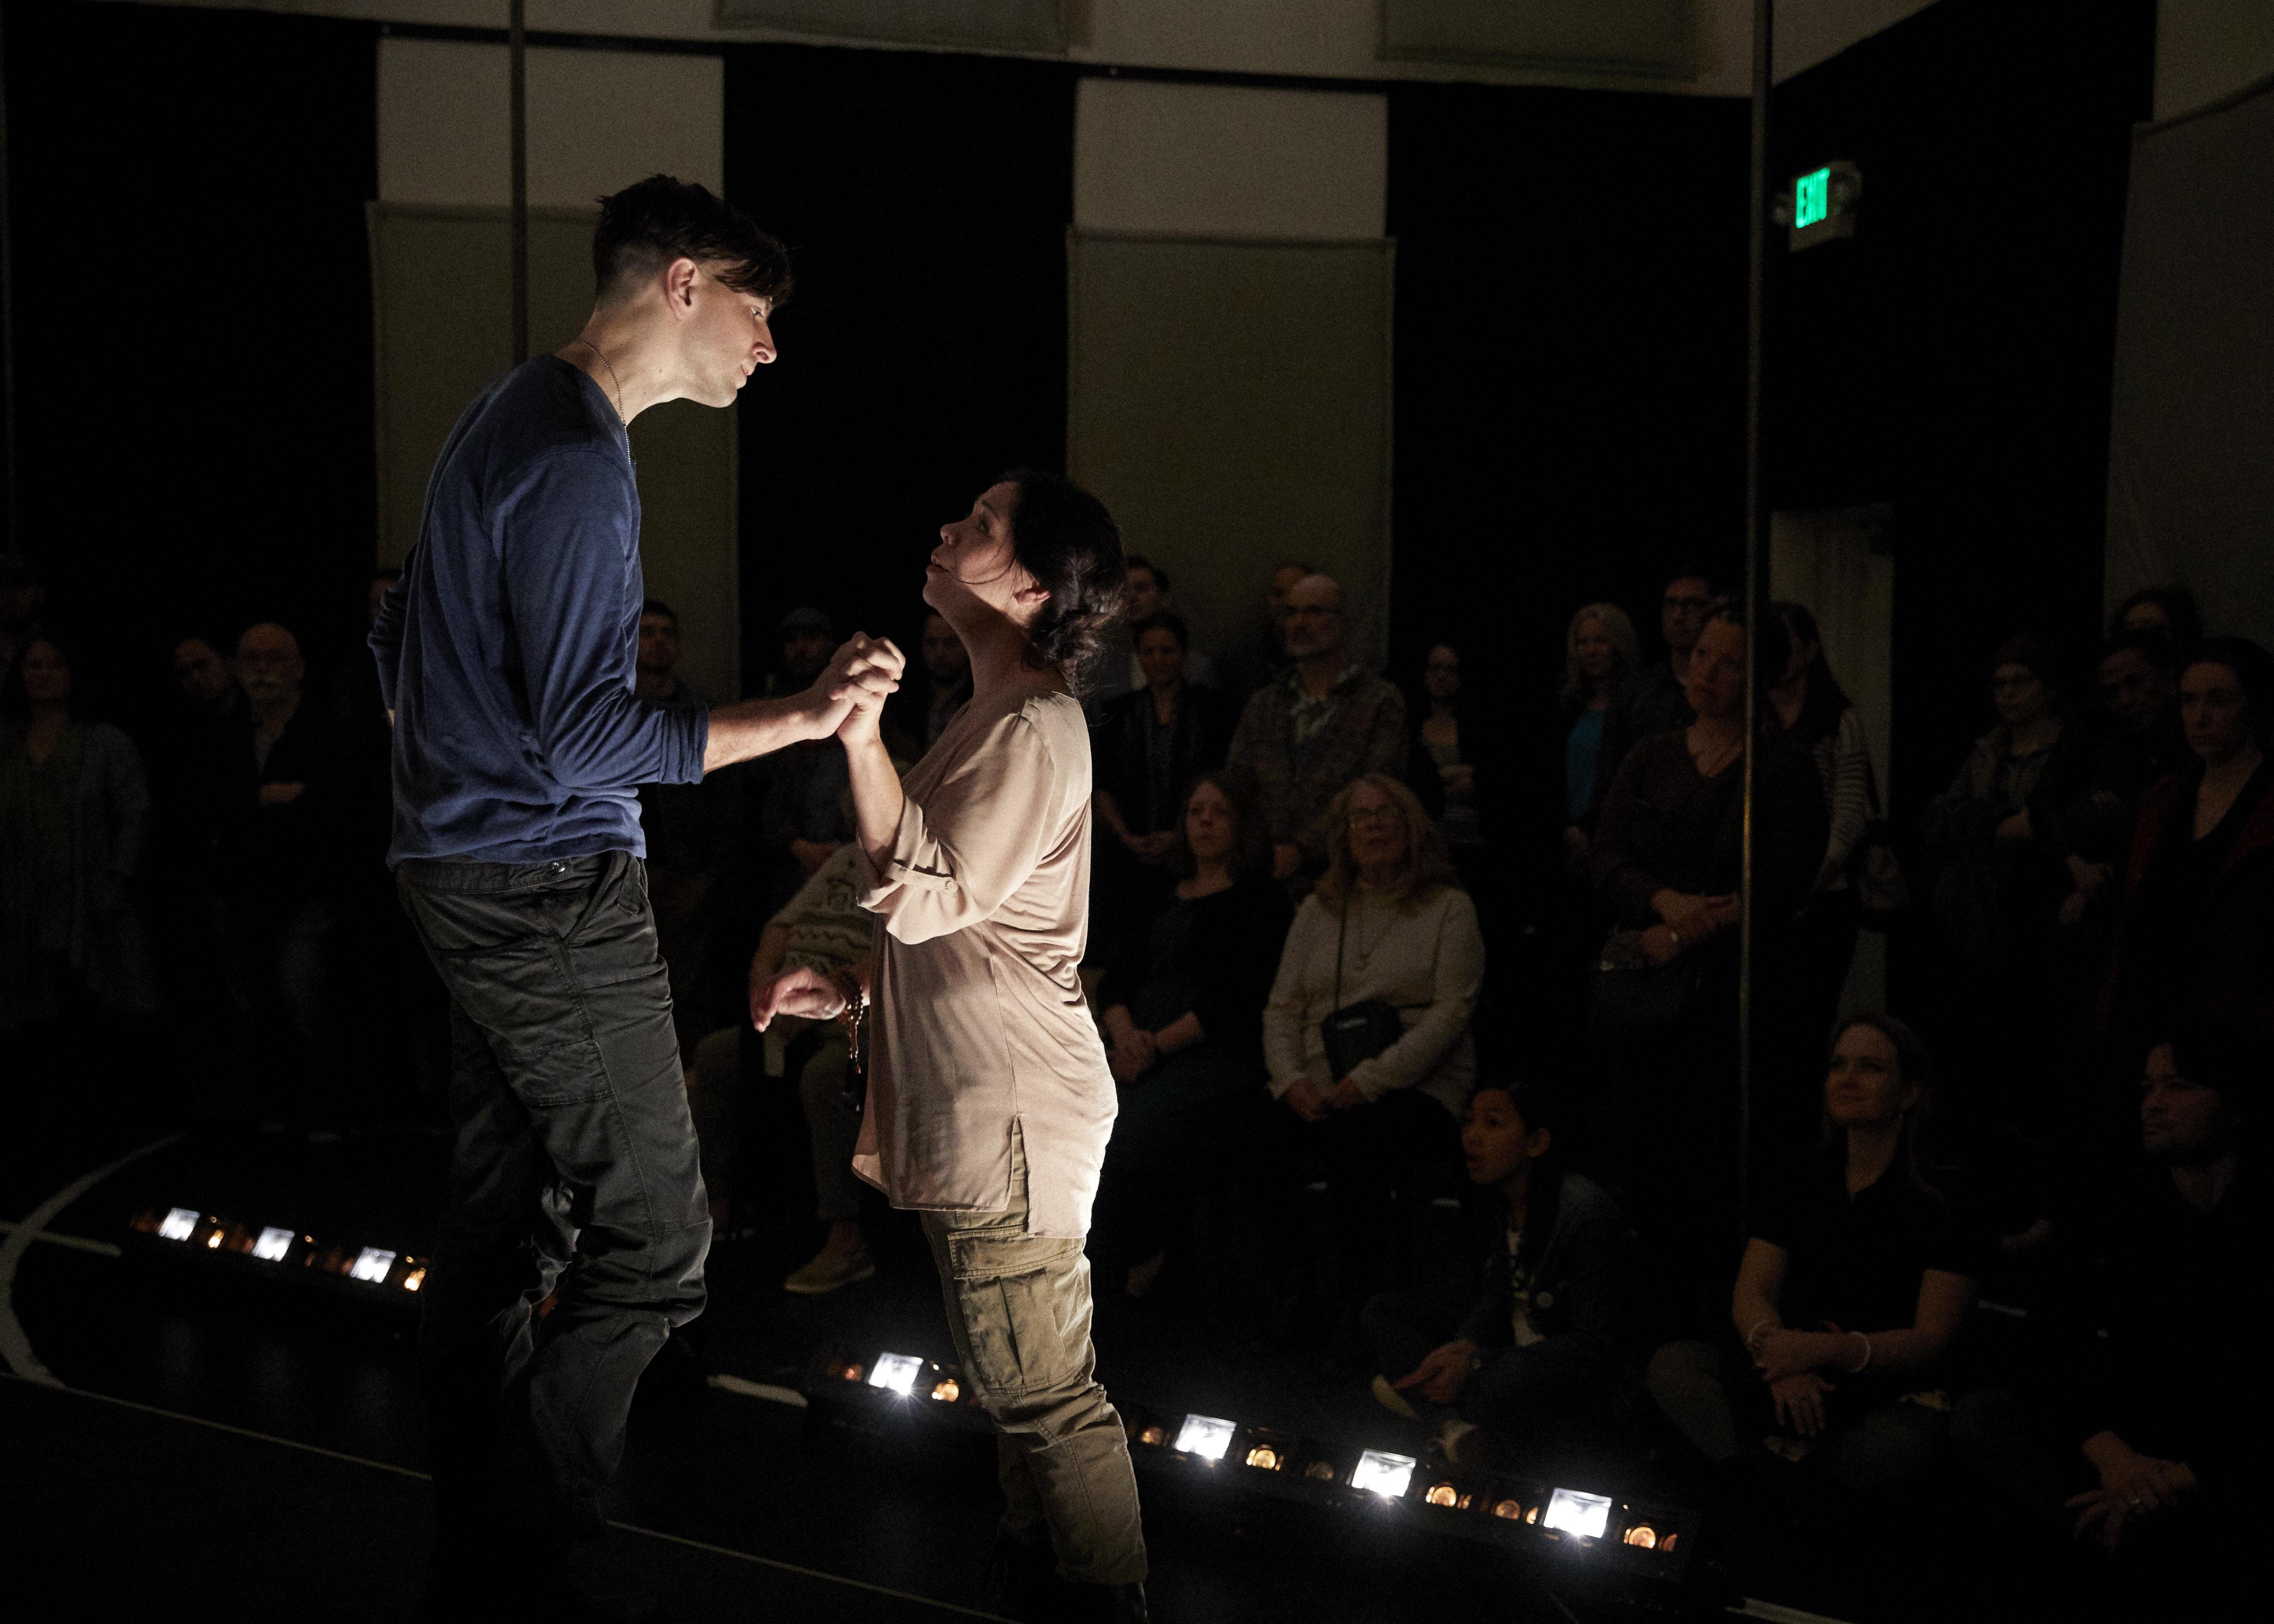 Thomas Segen (Tancredi) and Tess Altiveros (Clorinda). Foto: Philip Newton